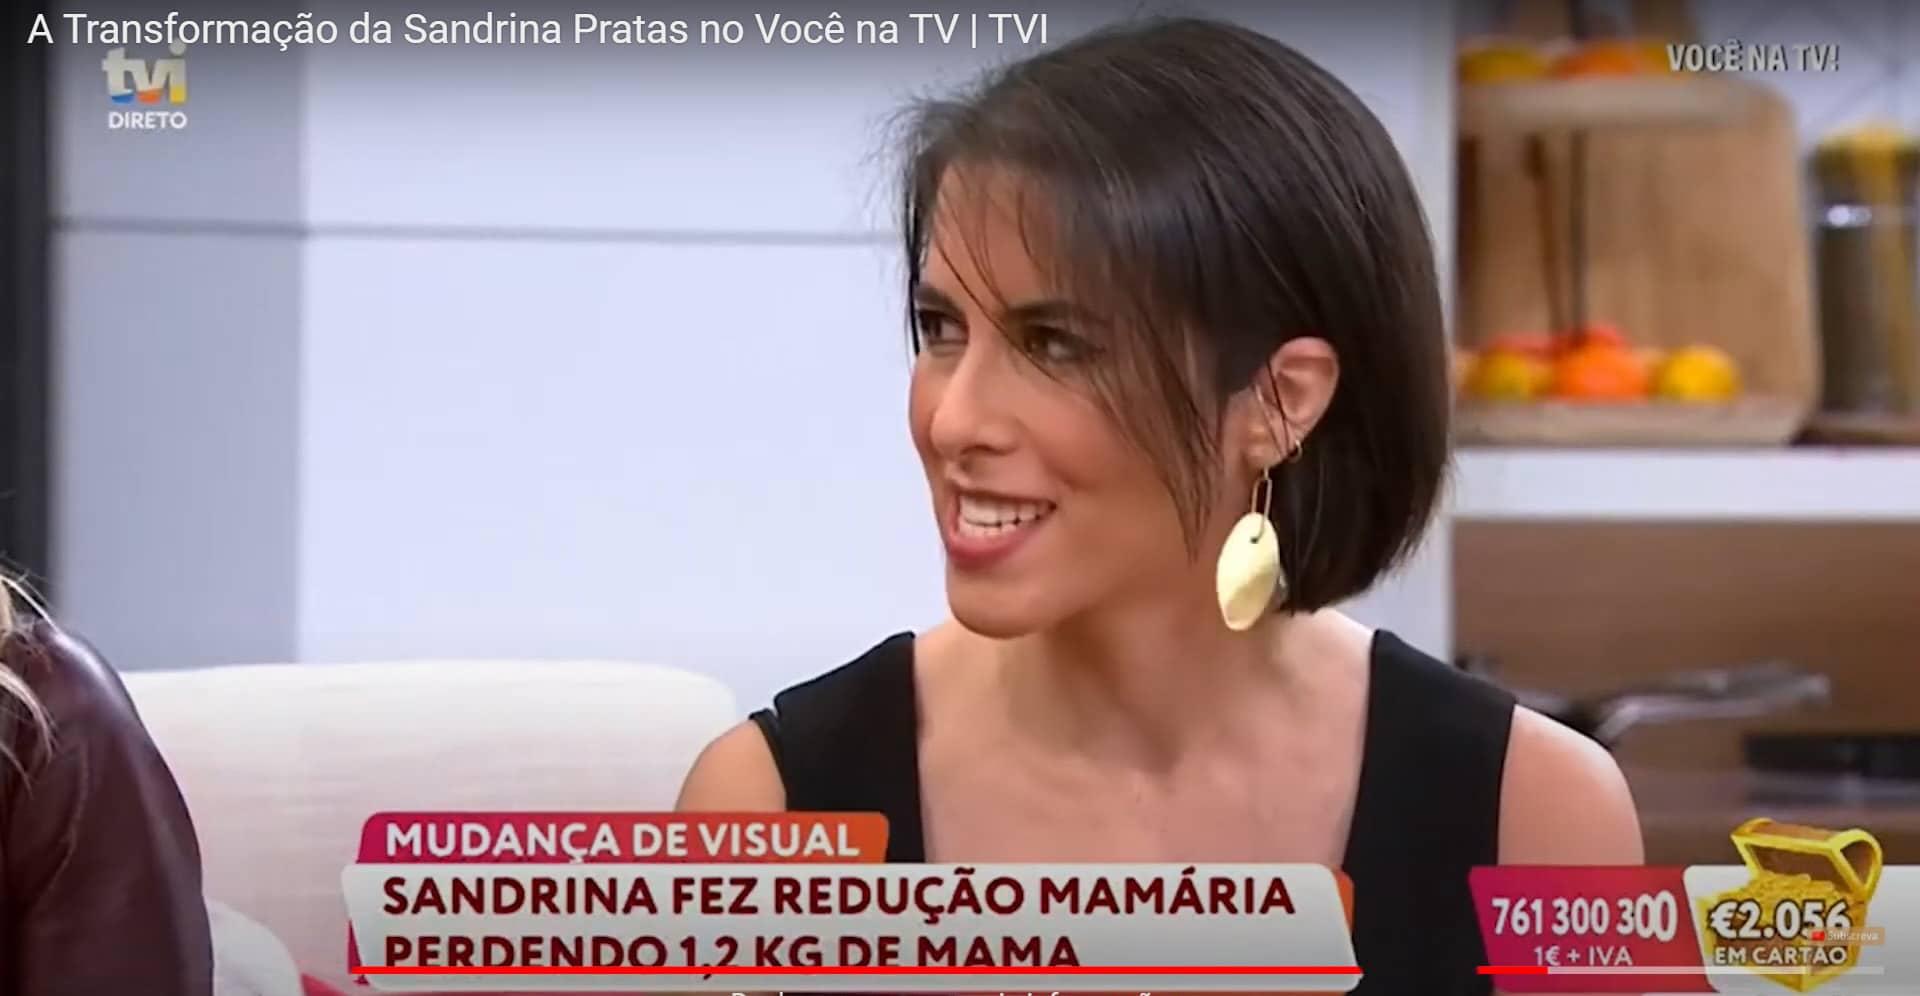 Dra. Mariana da Rocha Martins/ Cirurgiã Plástica